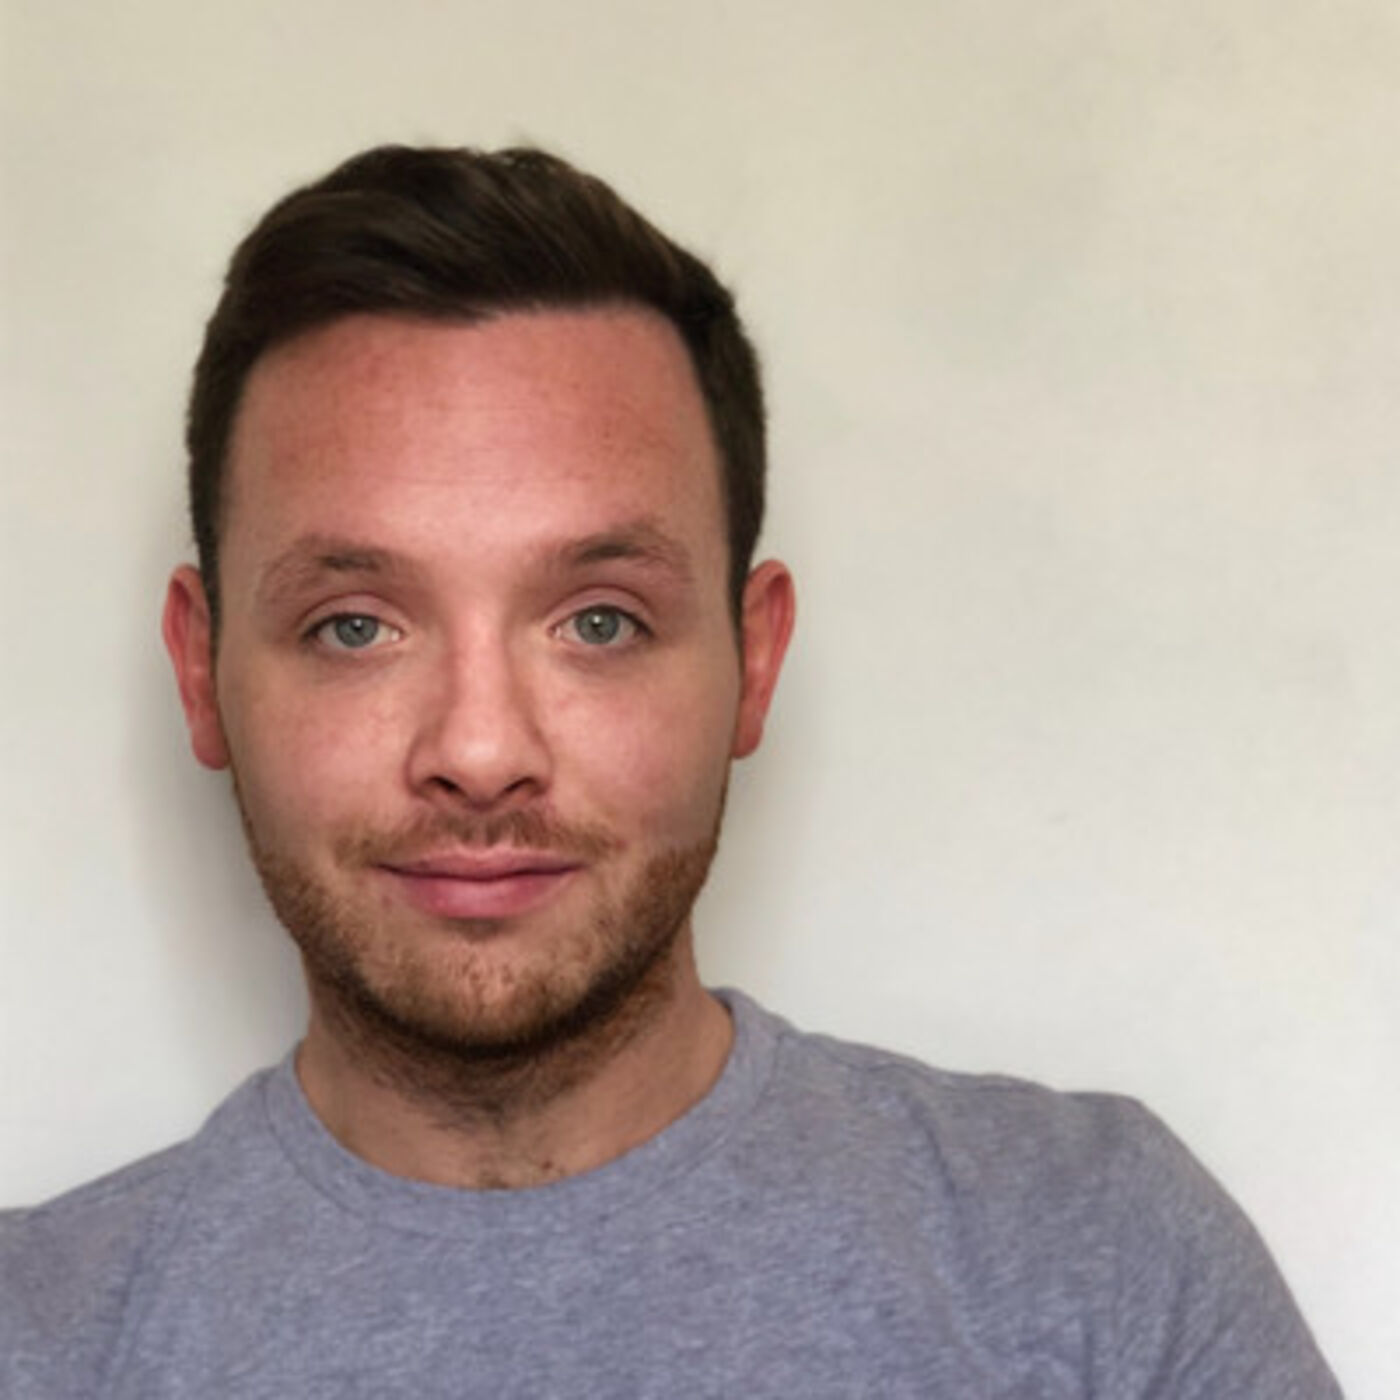 #40 Expert in Mobile App Marketing, Josh Lloyd created Envision Digital to enhance user engagement